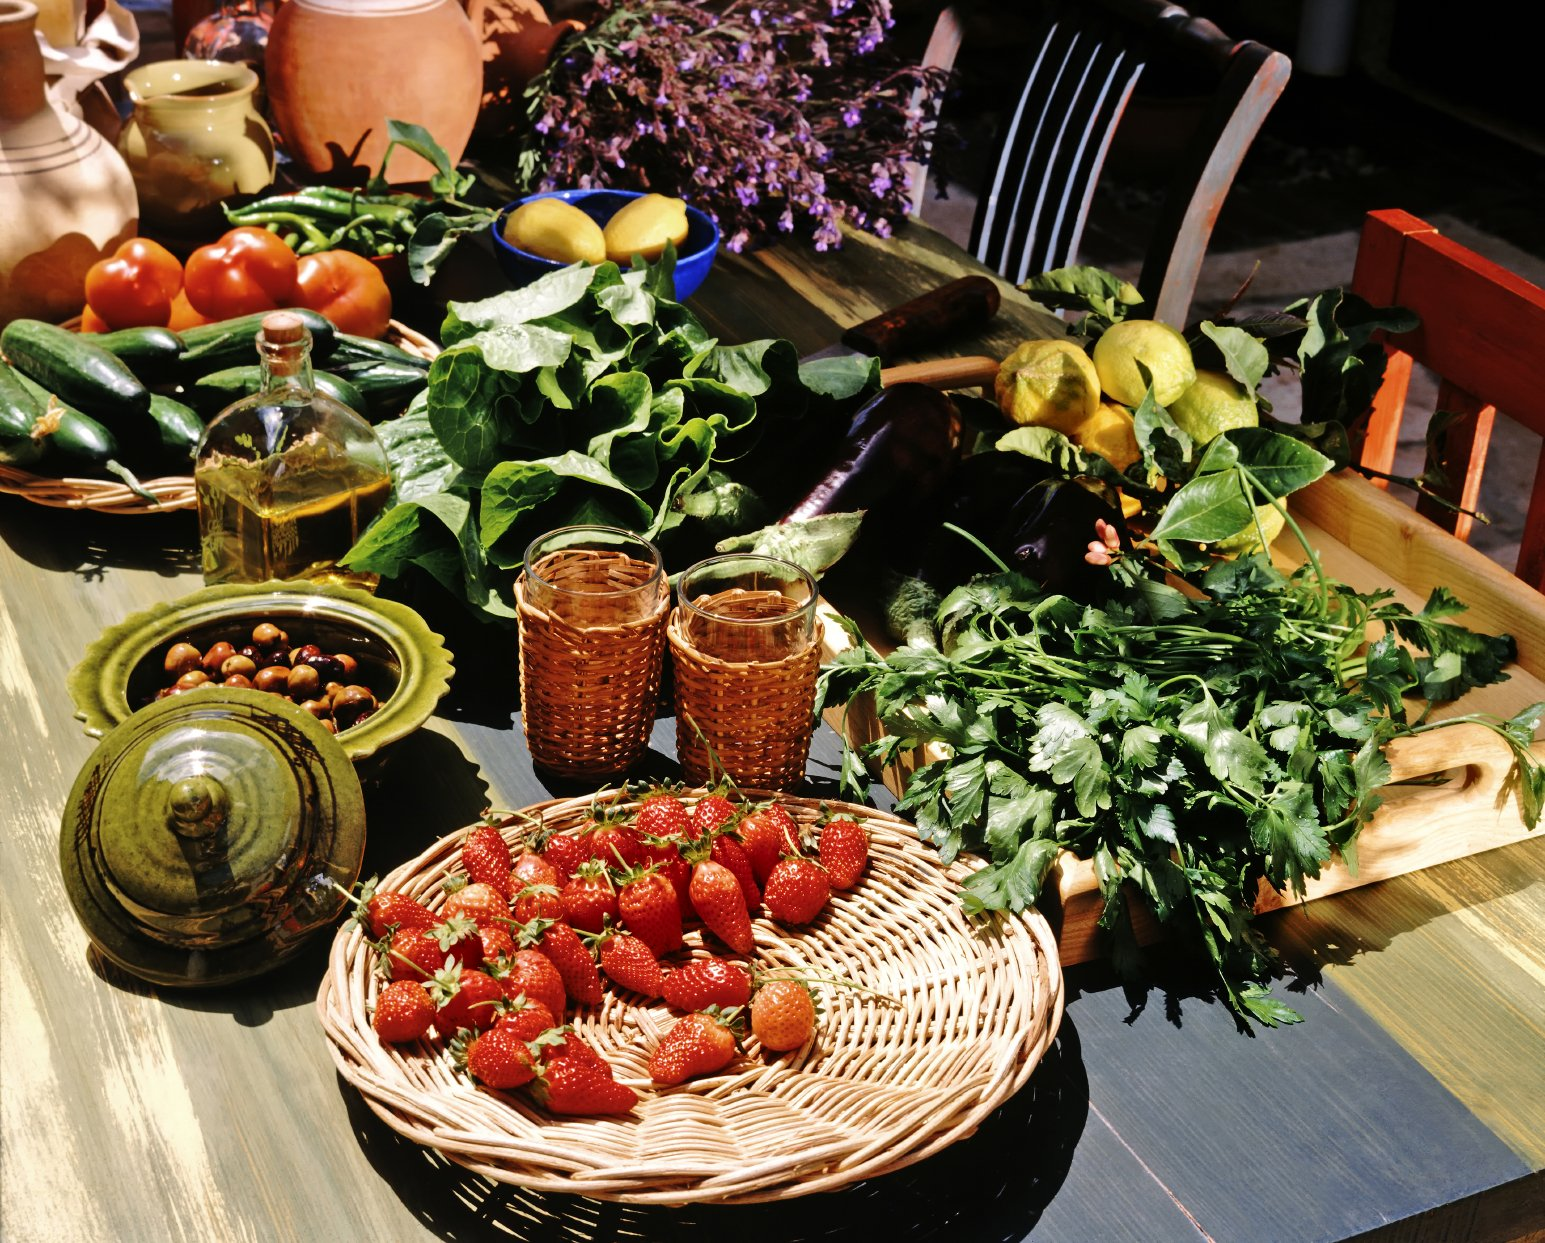 Mediterranean still life with healthy food ingredients